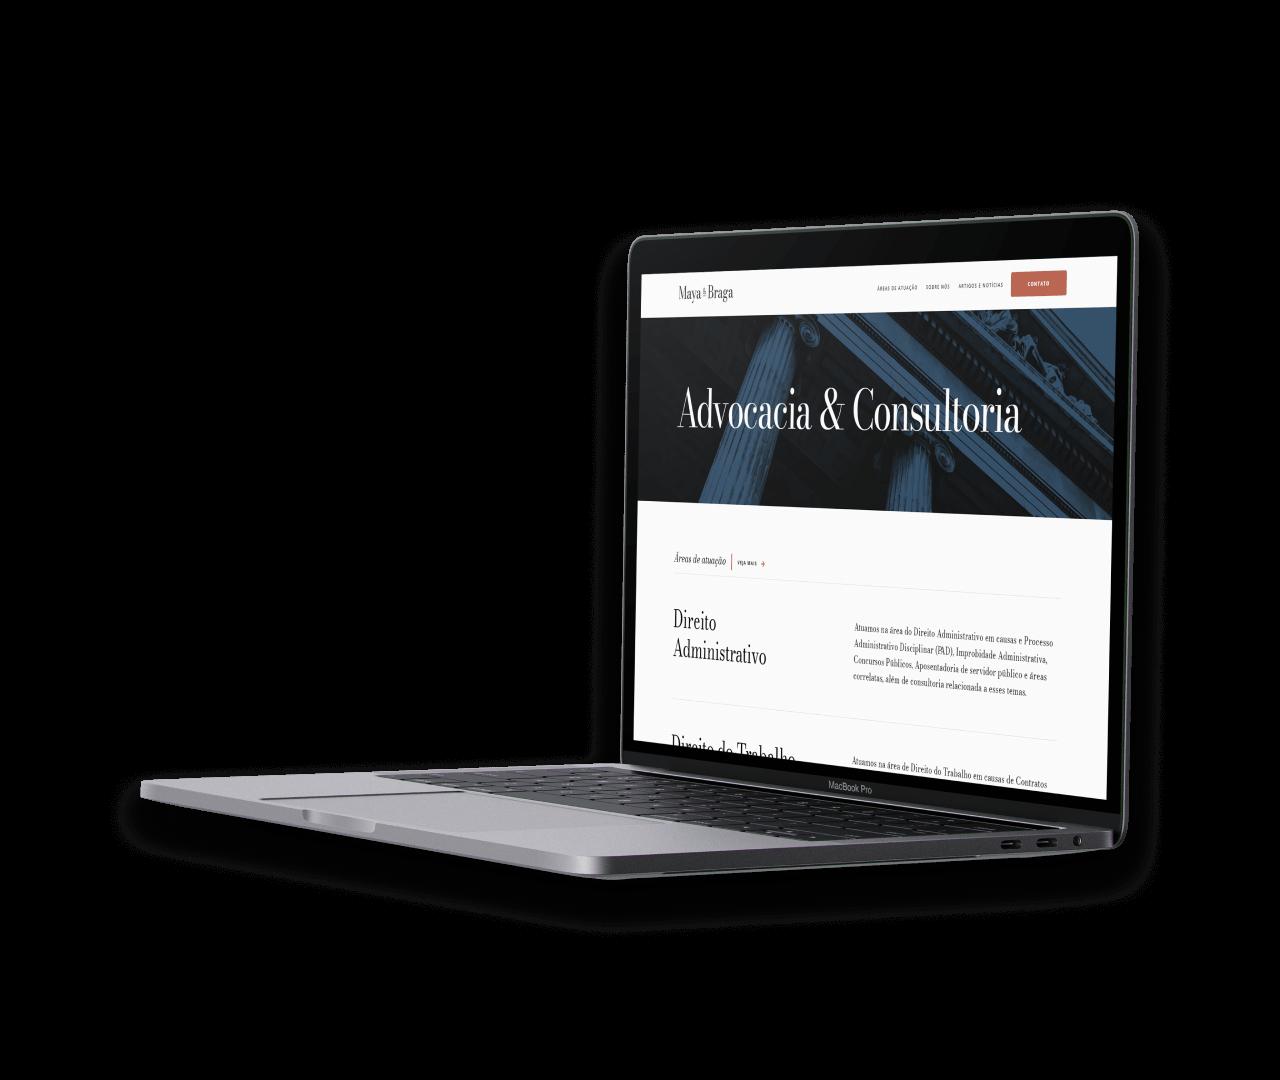 macbook displaying maya e braga's website